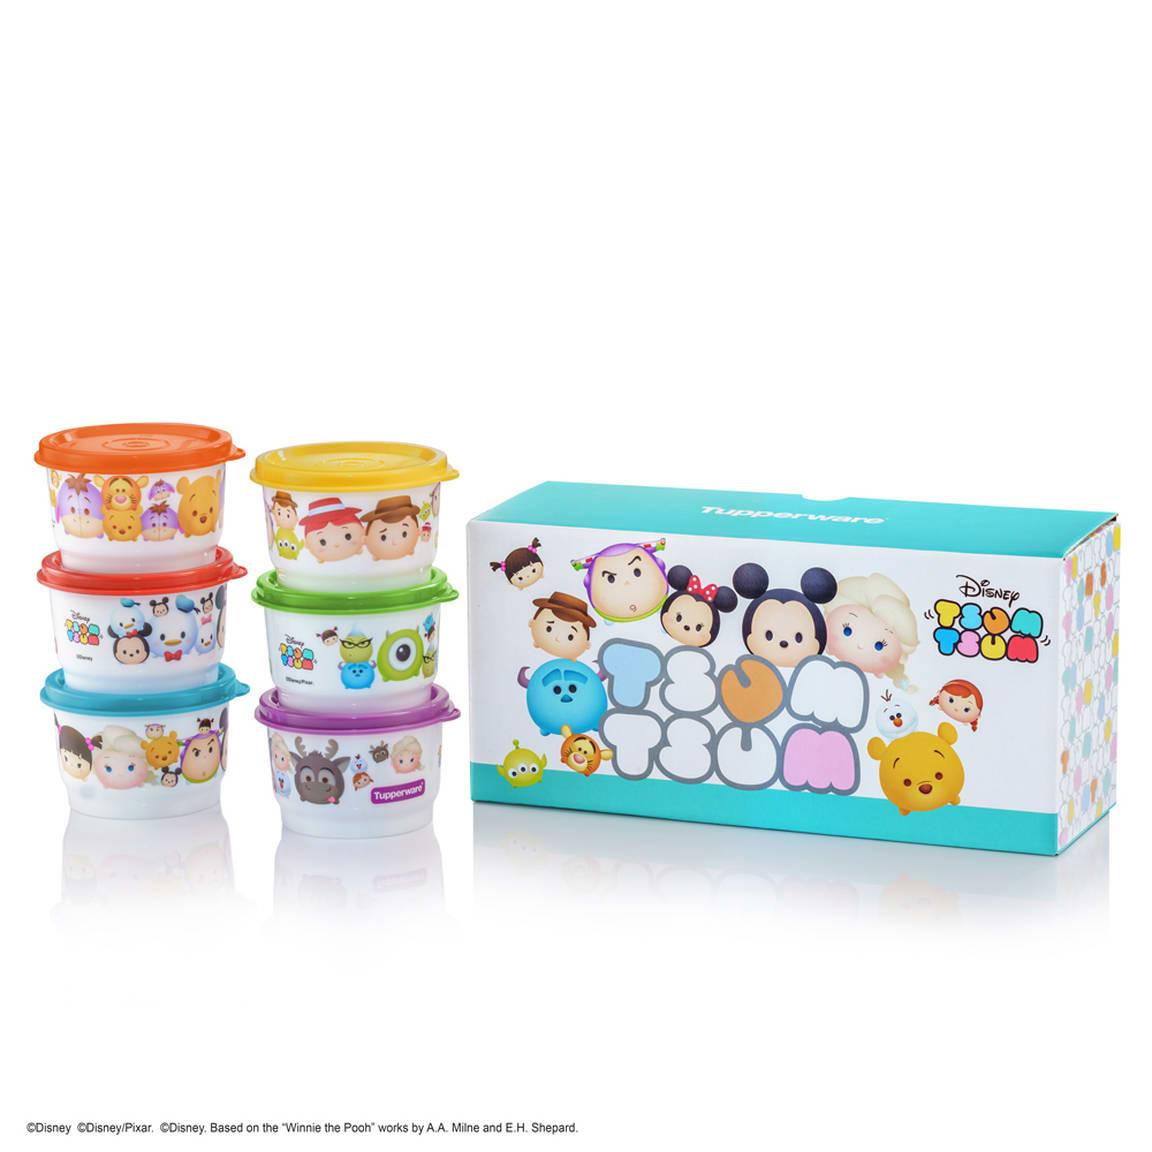 Disney Tsum-Tsum Gift Set